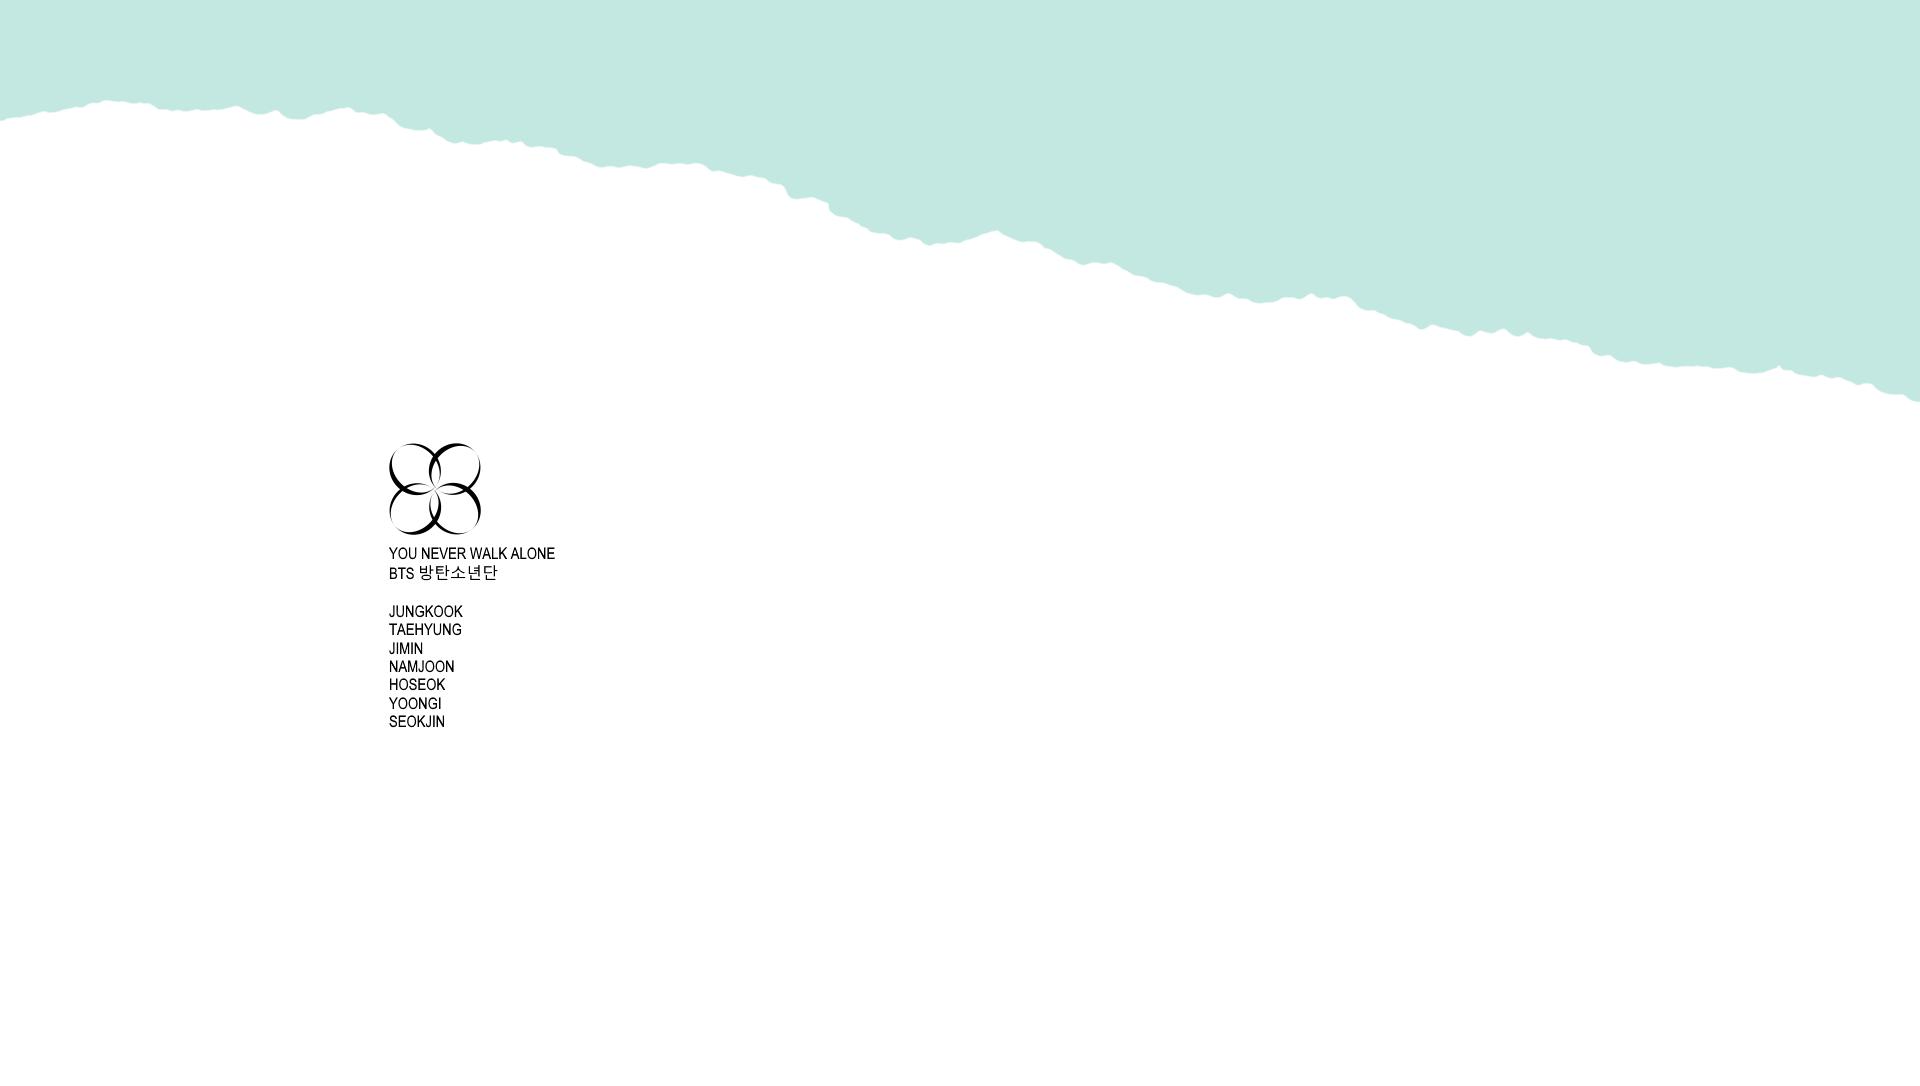 You Never Walk Alone Desktop Wallpaper Tumblr Bts 364583